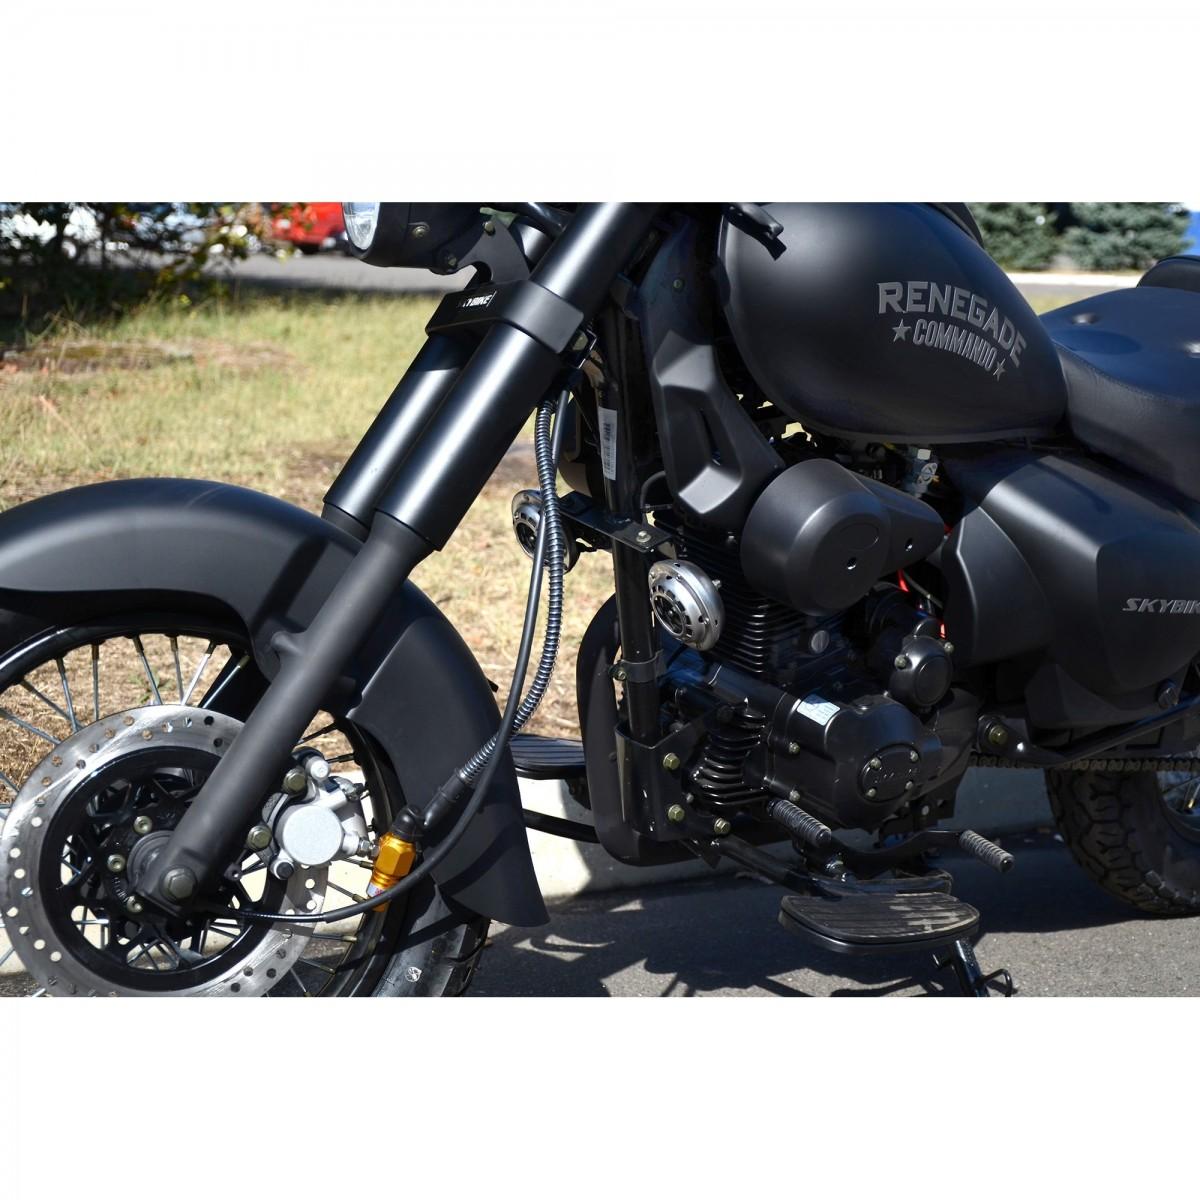 Фото - Skybike Renegade 200